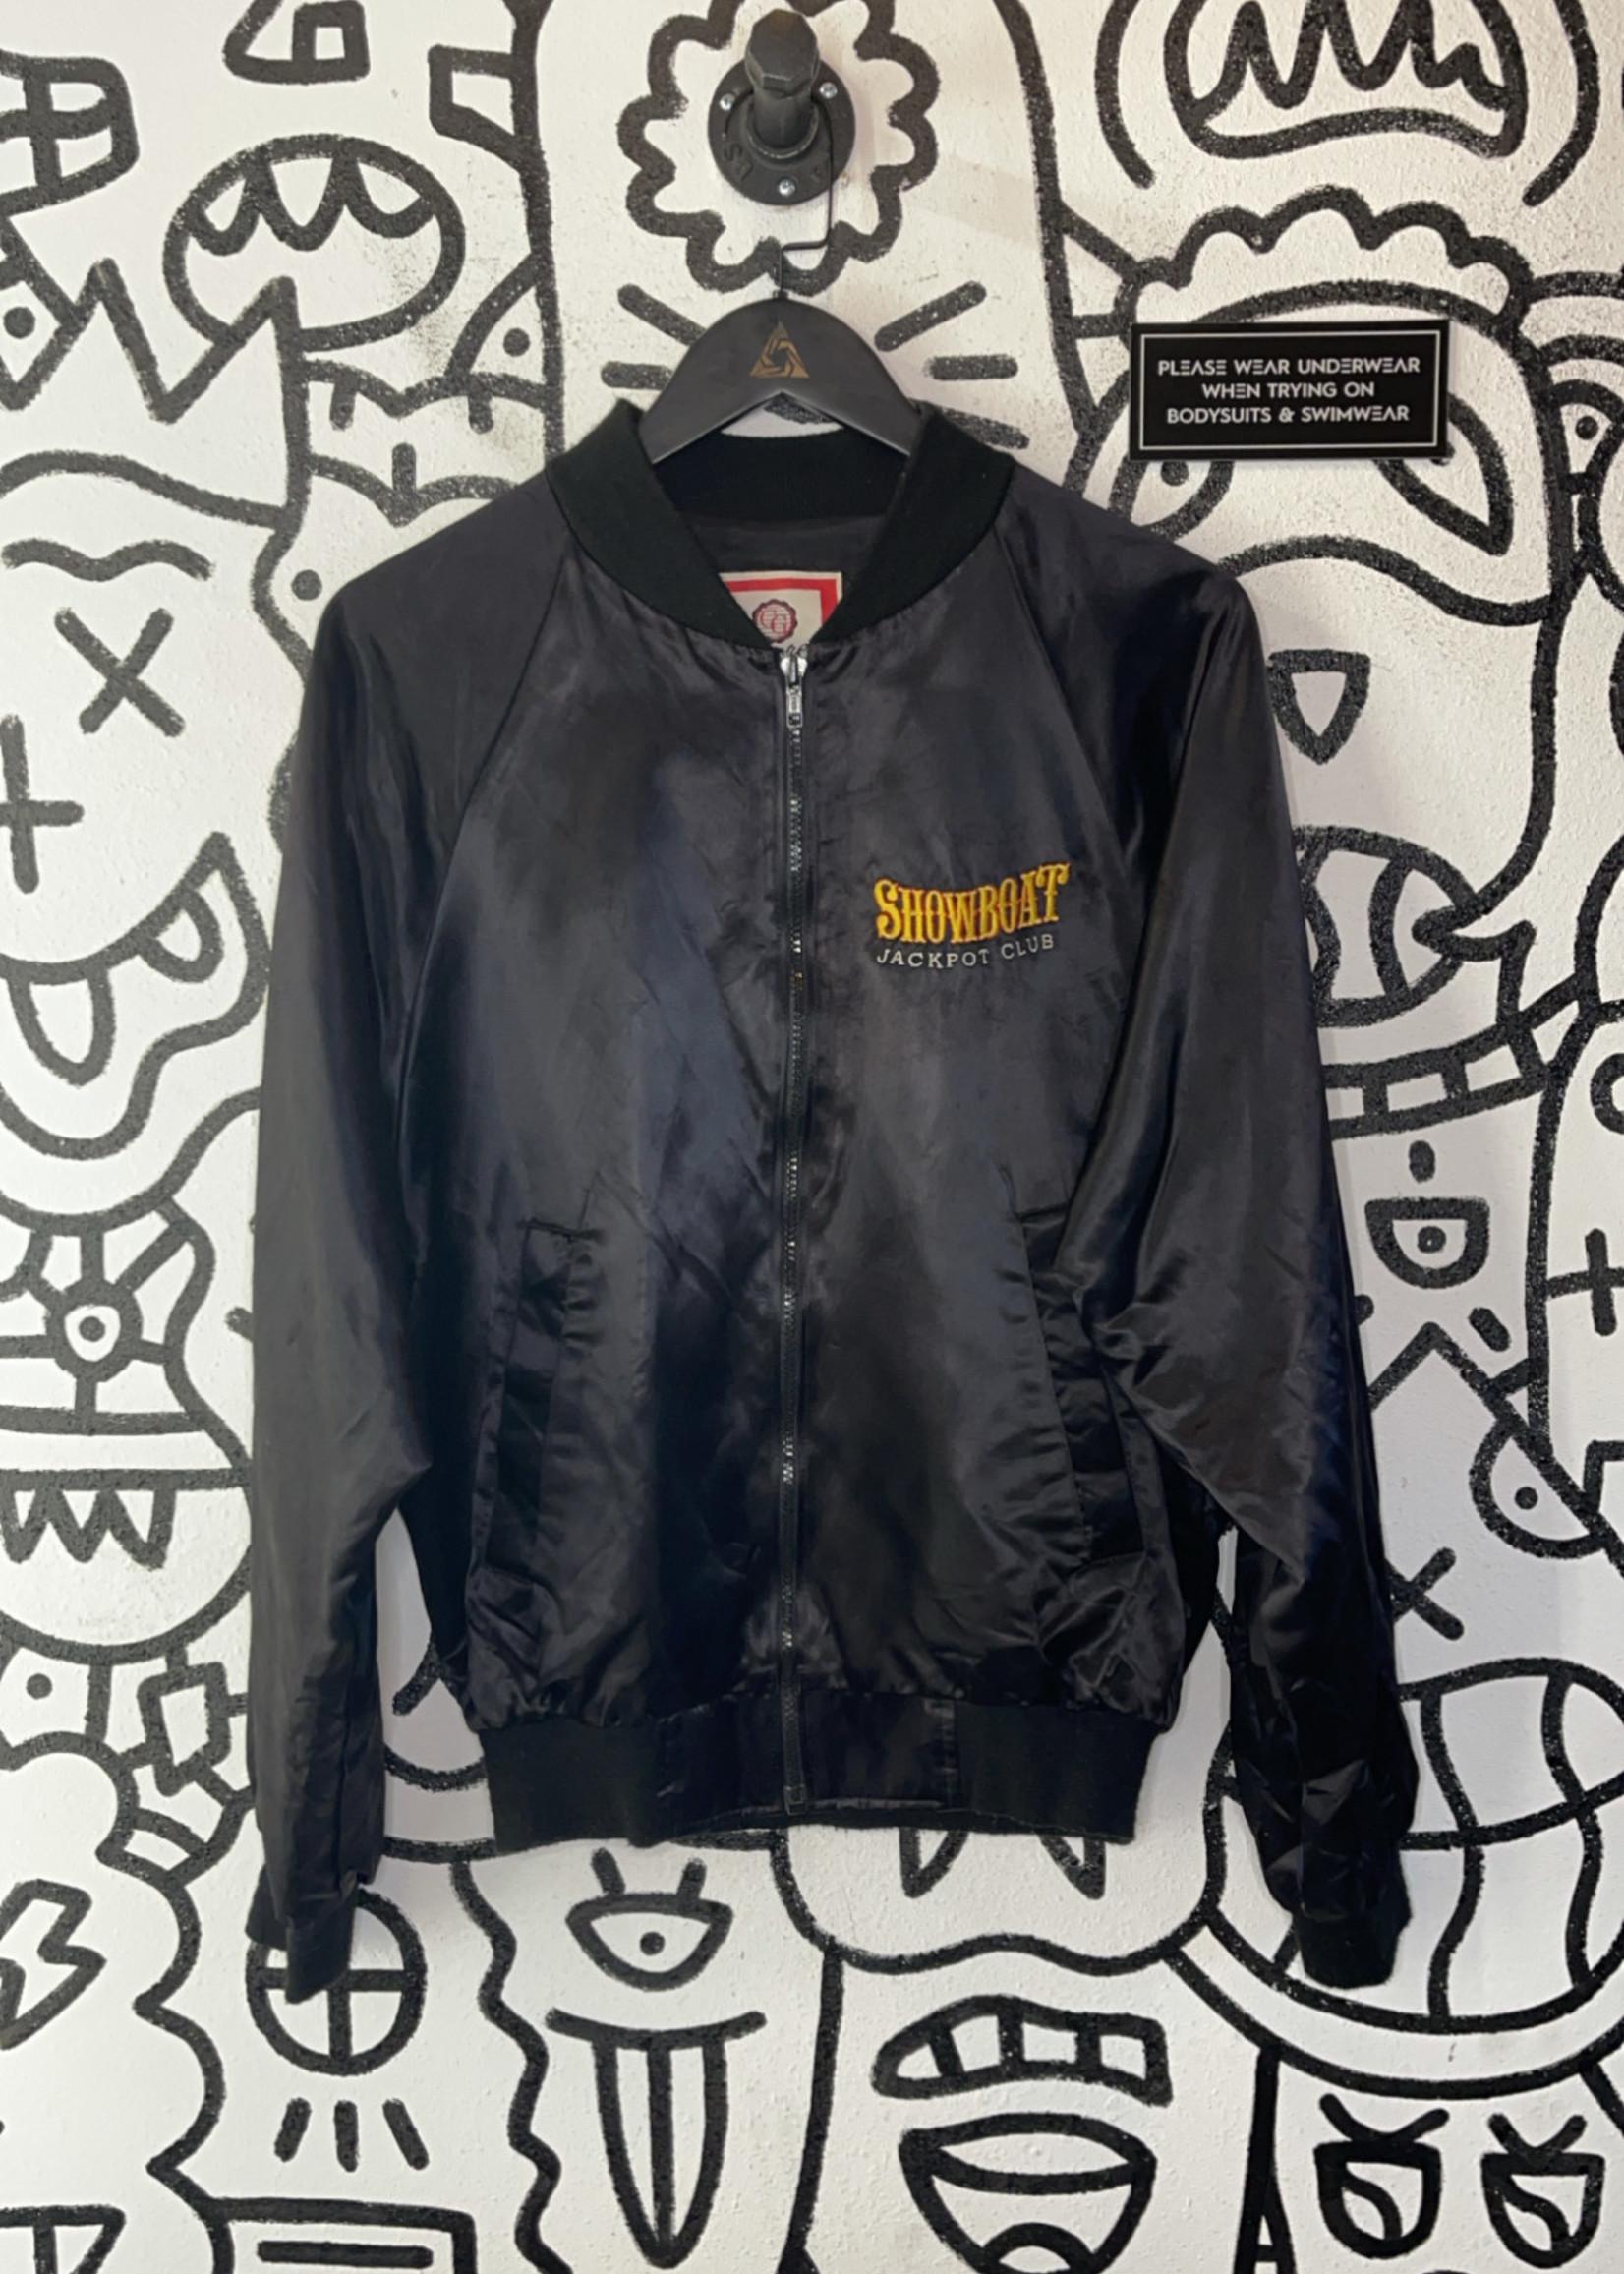 Vintage black showboat las vegas bomber jacket M